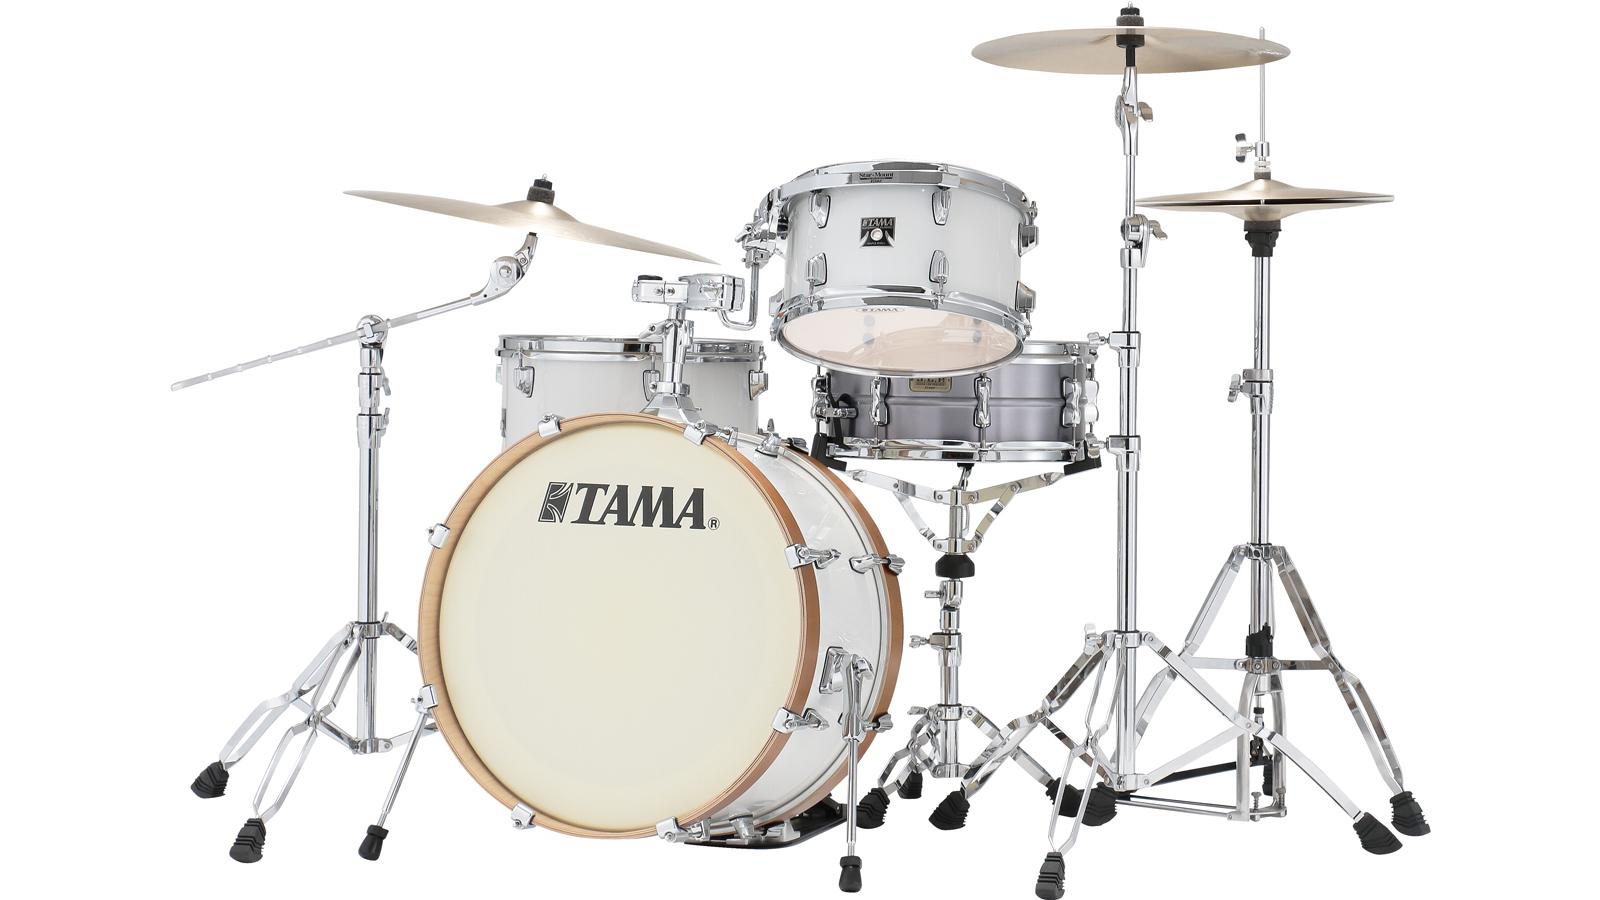 Tama CL30VS-WSM Superstar Classic Neo-Mod Kit